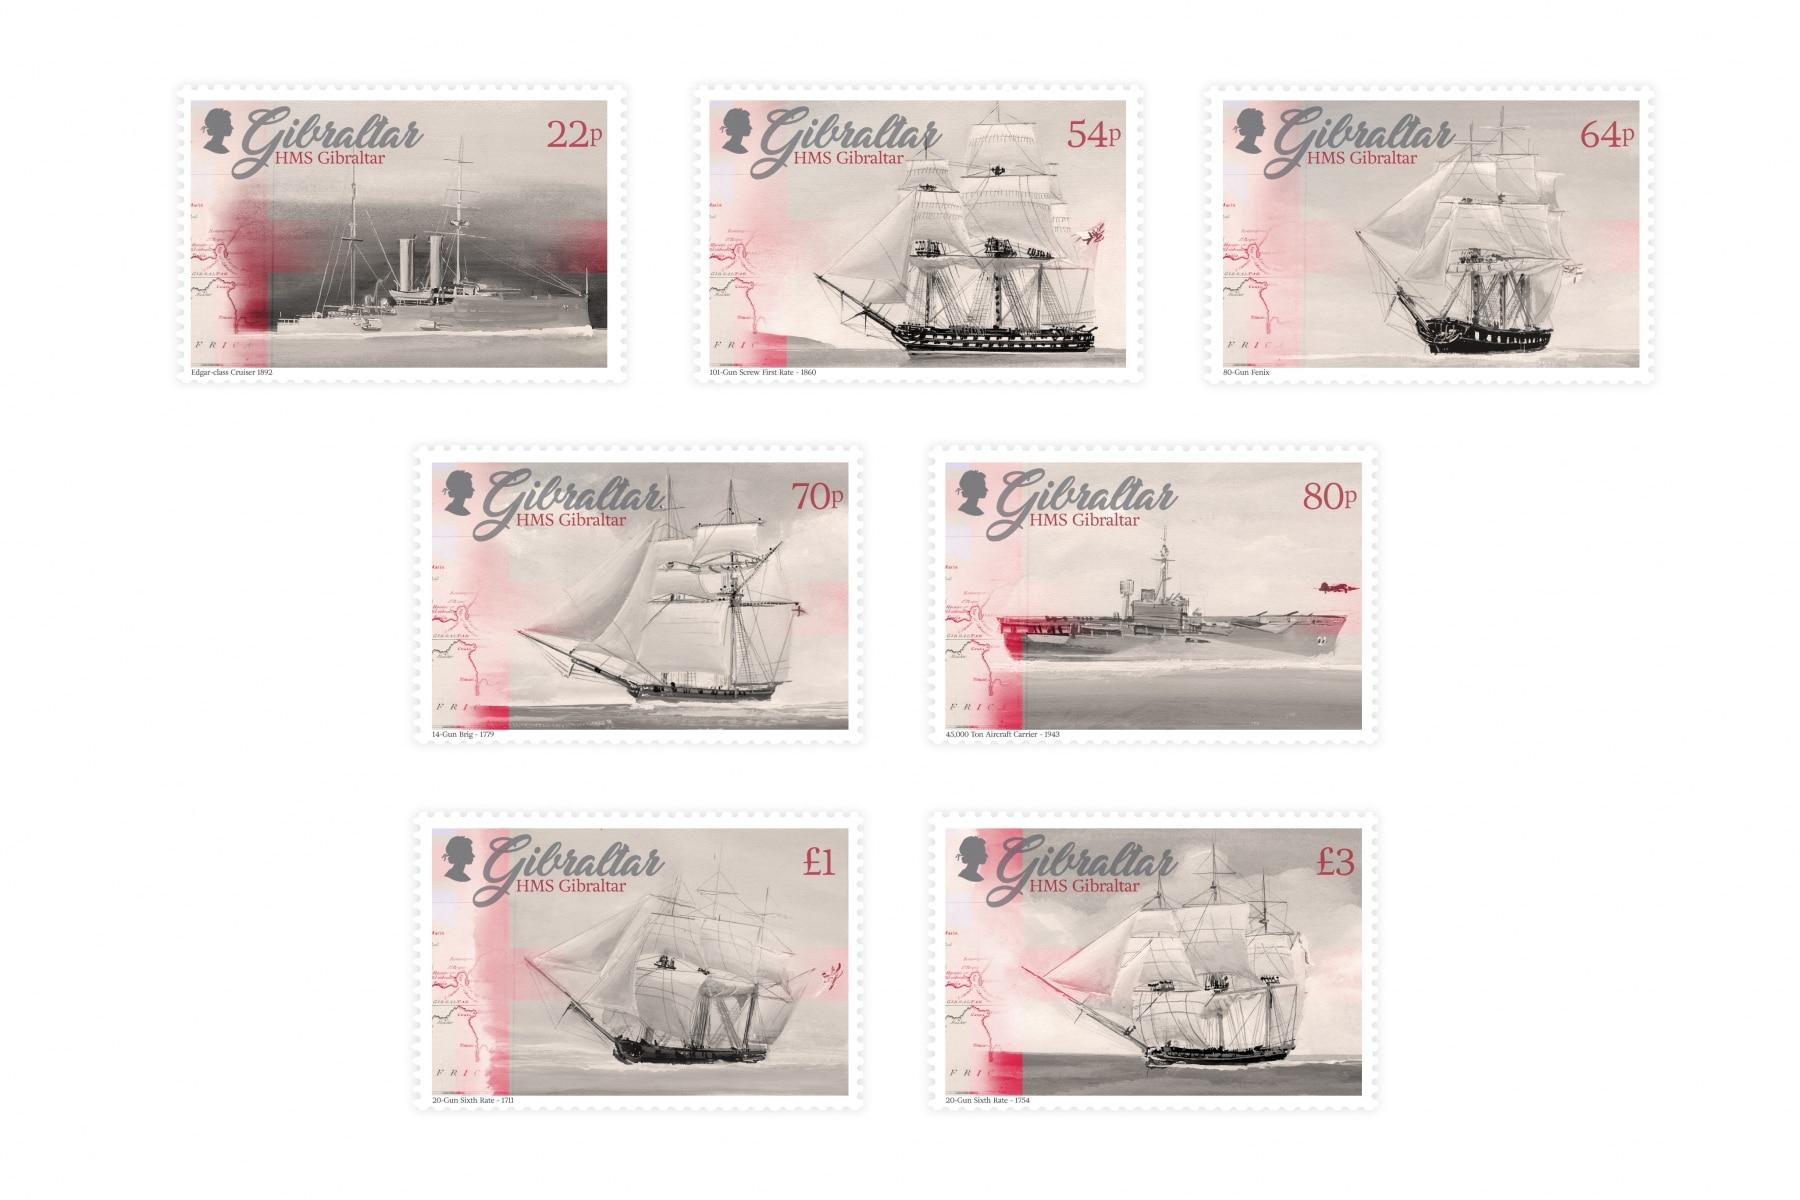 2017-HMS-Gibraltar-set